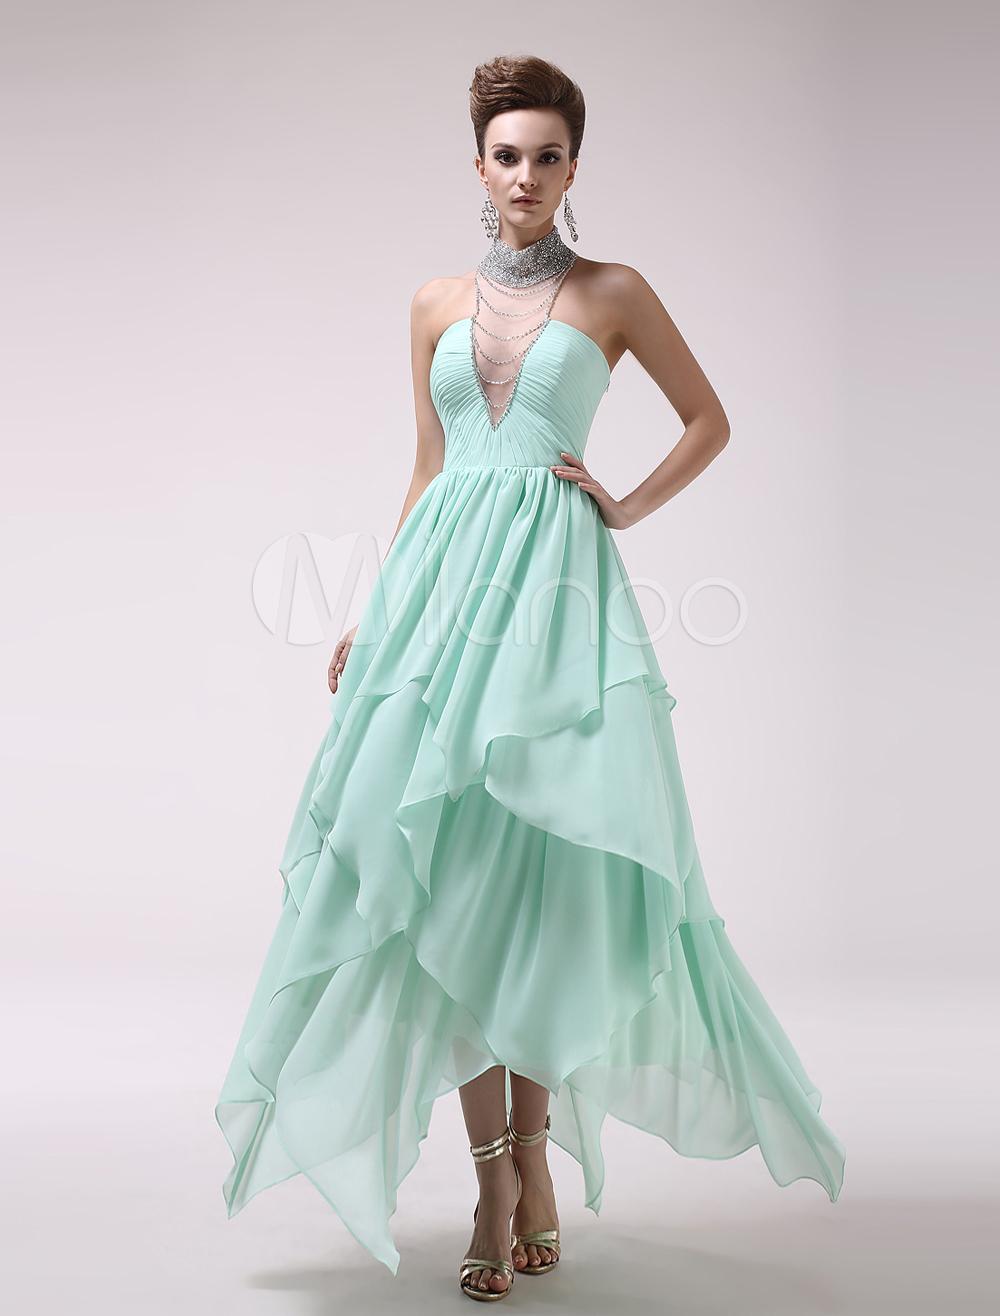 Mint green high collar ruched aline chiffon fashion prom dress